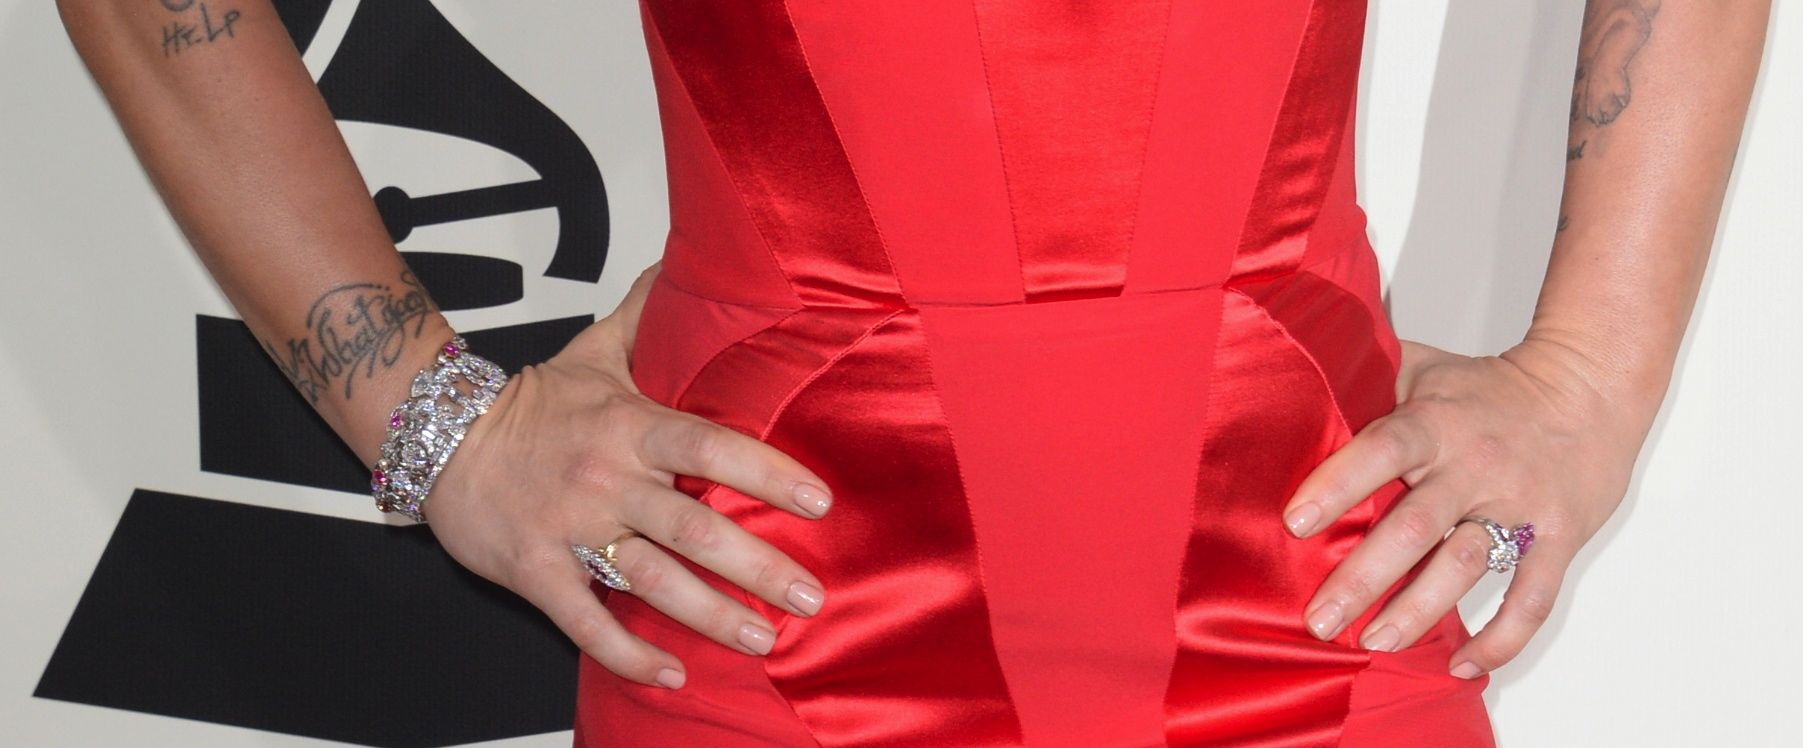 Grammys 2014 Beauty: P!nk\'s Makeup & Nails | Rouge 18